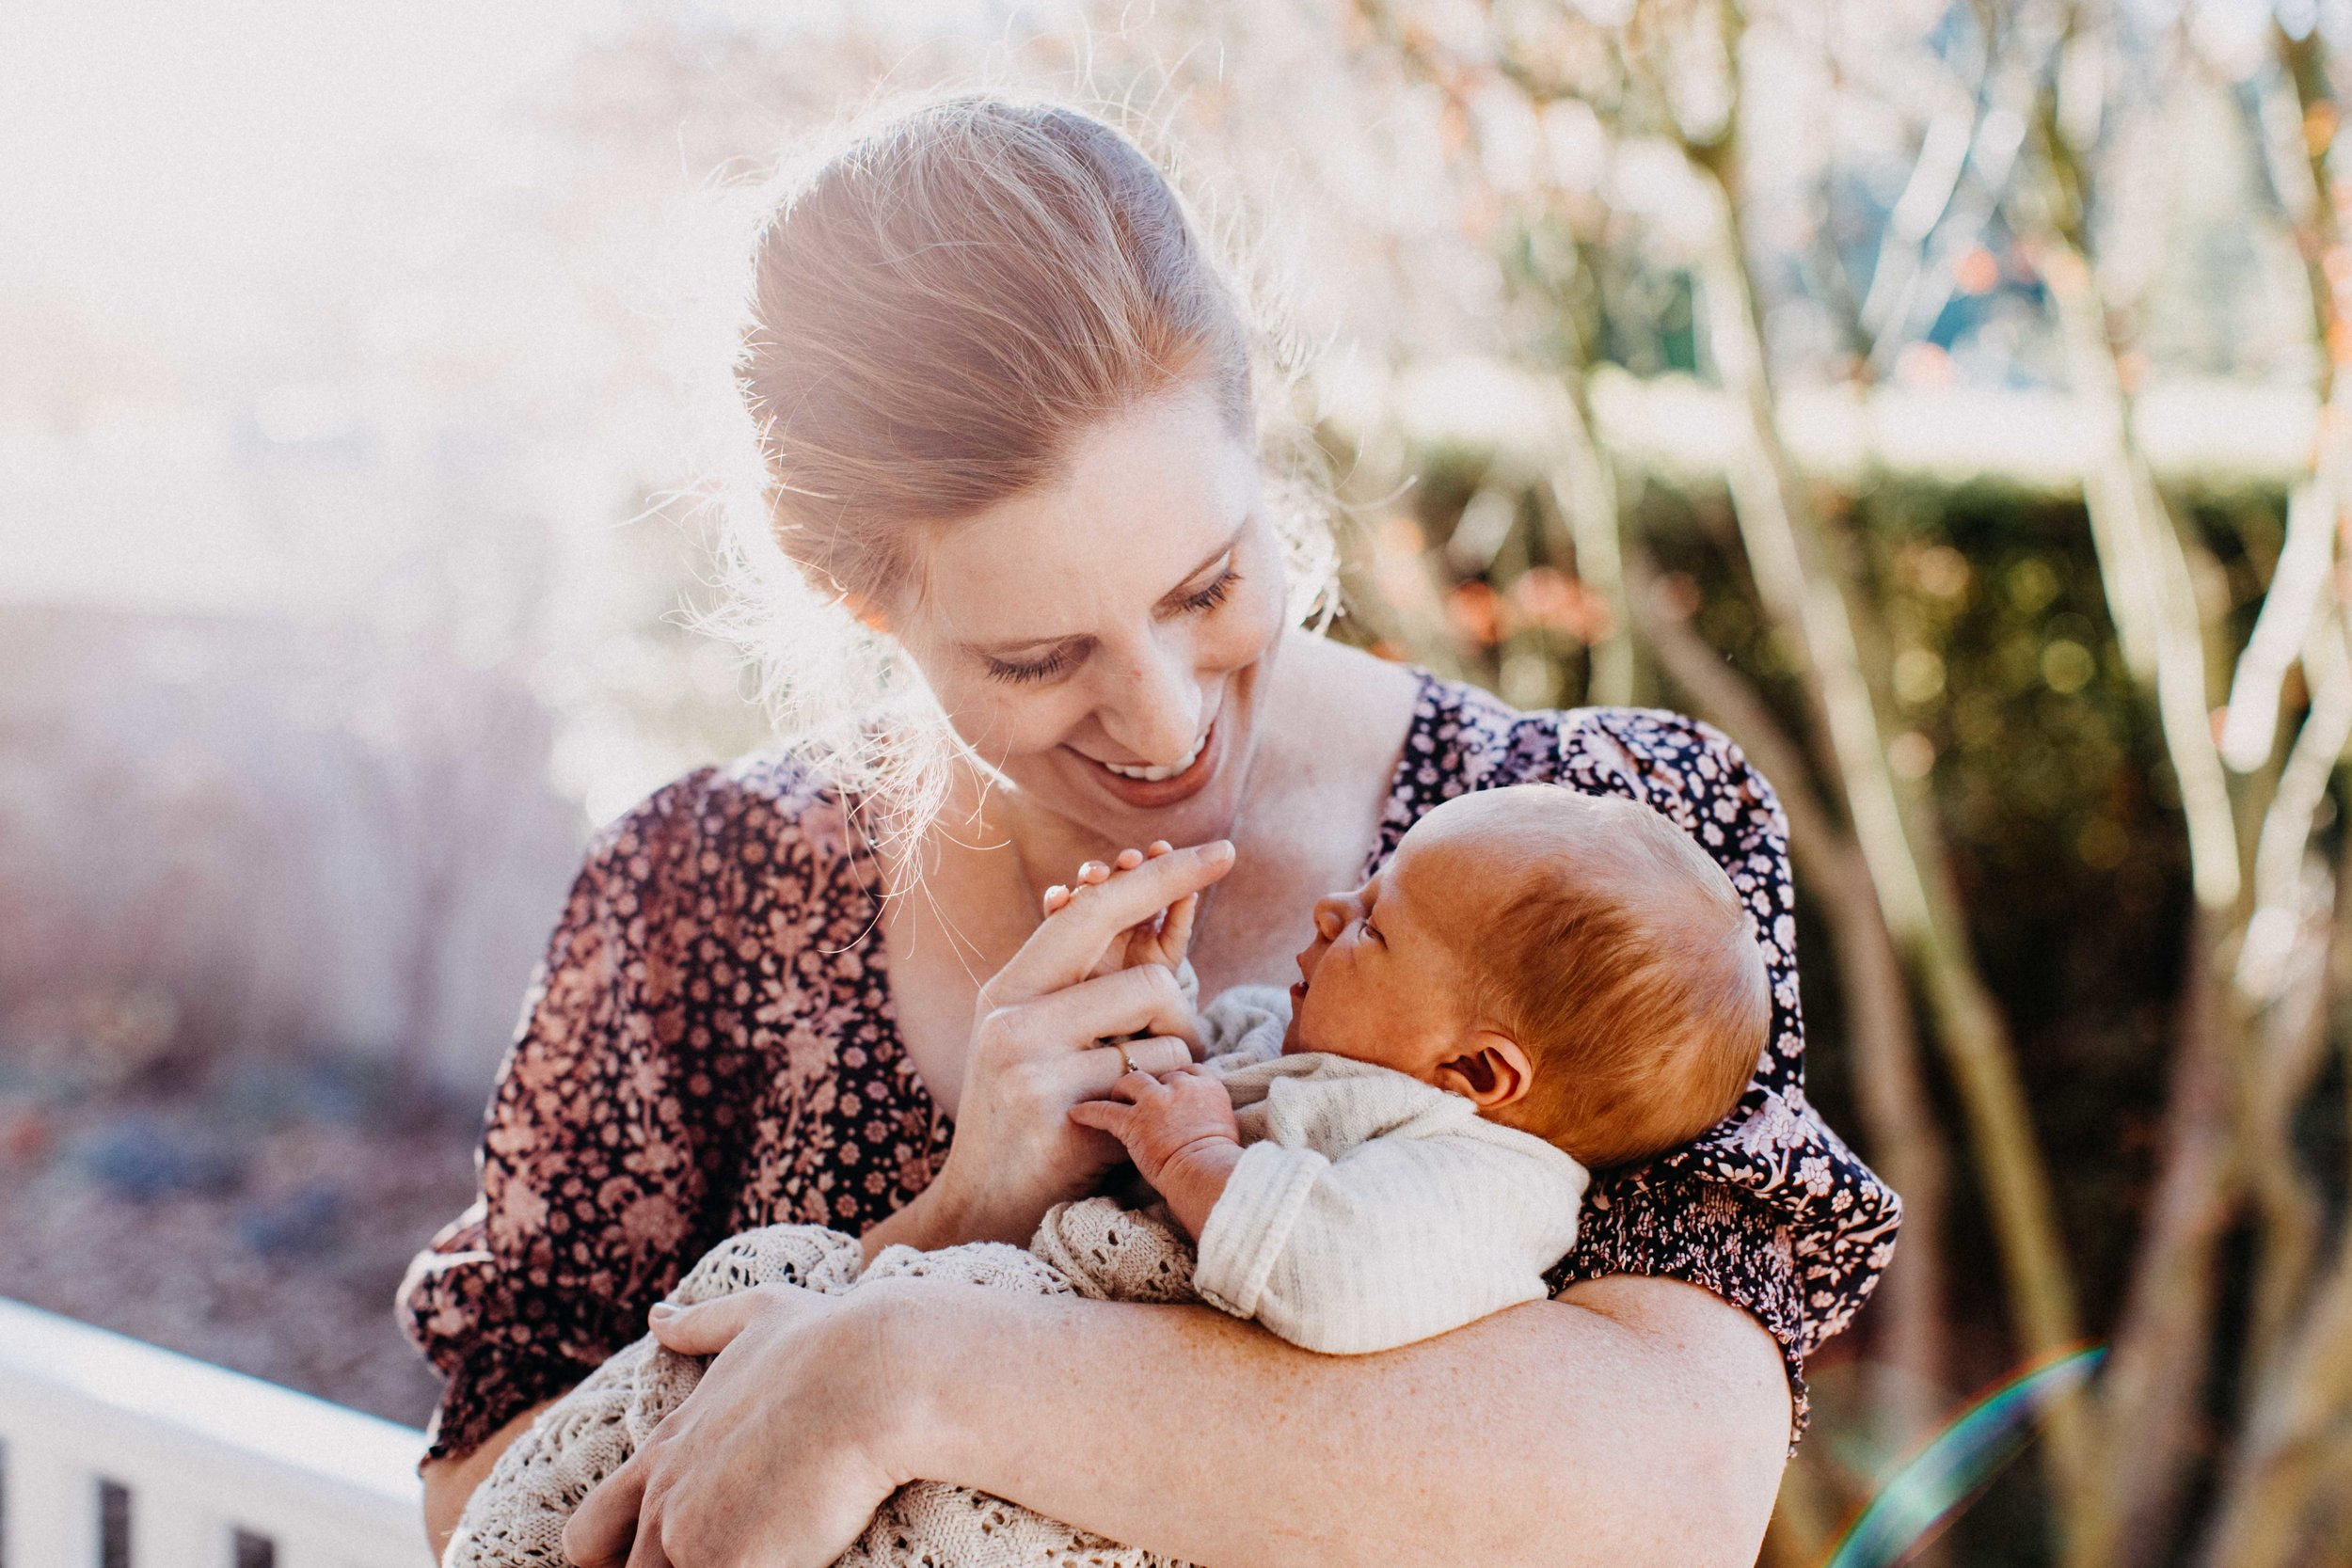 bowral-newborn-photographer-family-herrmann-southern-highlands-38.jpg